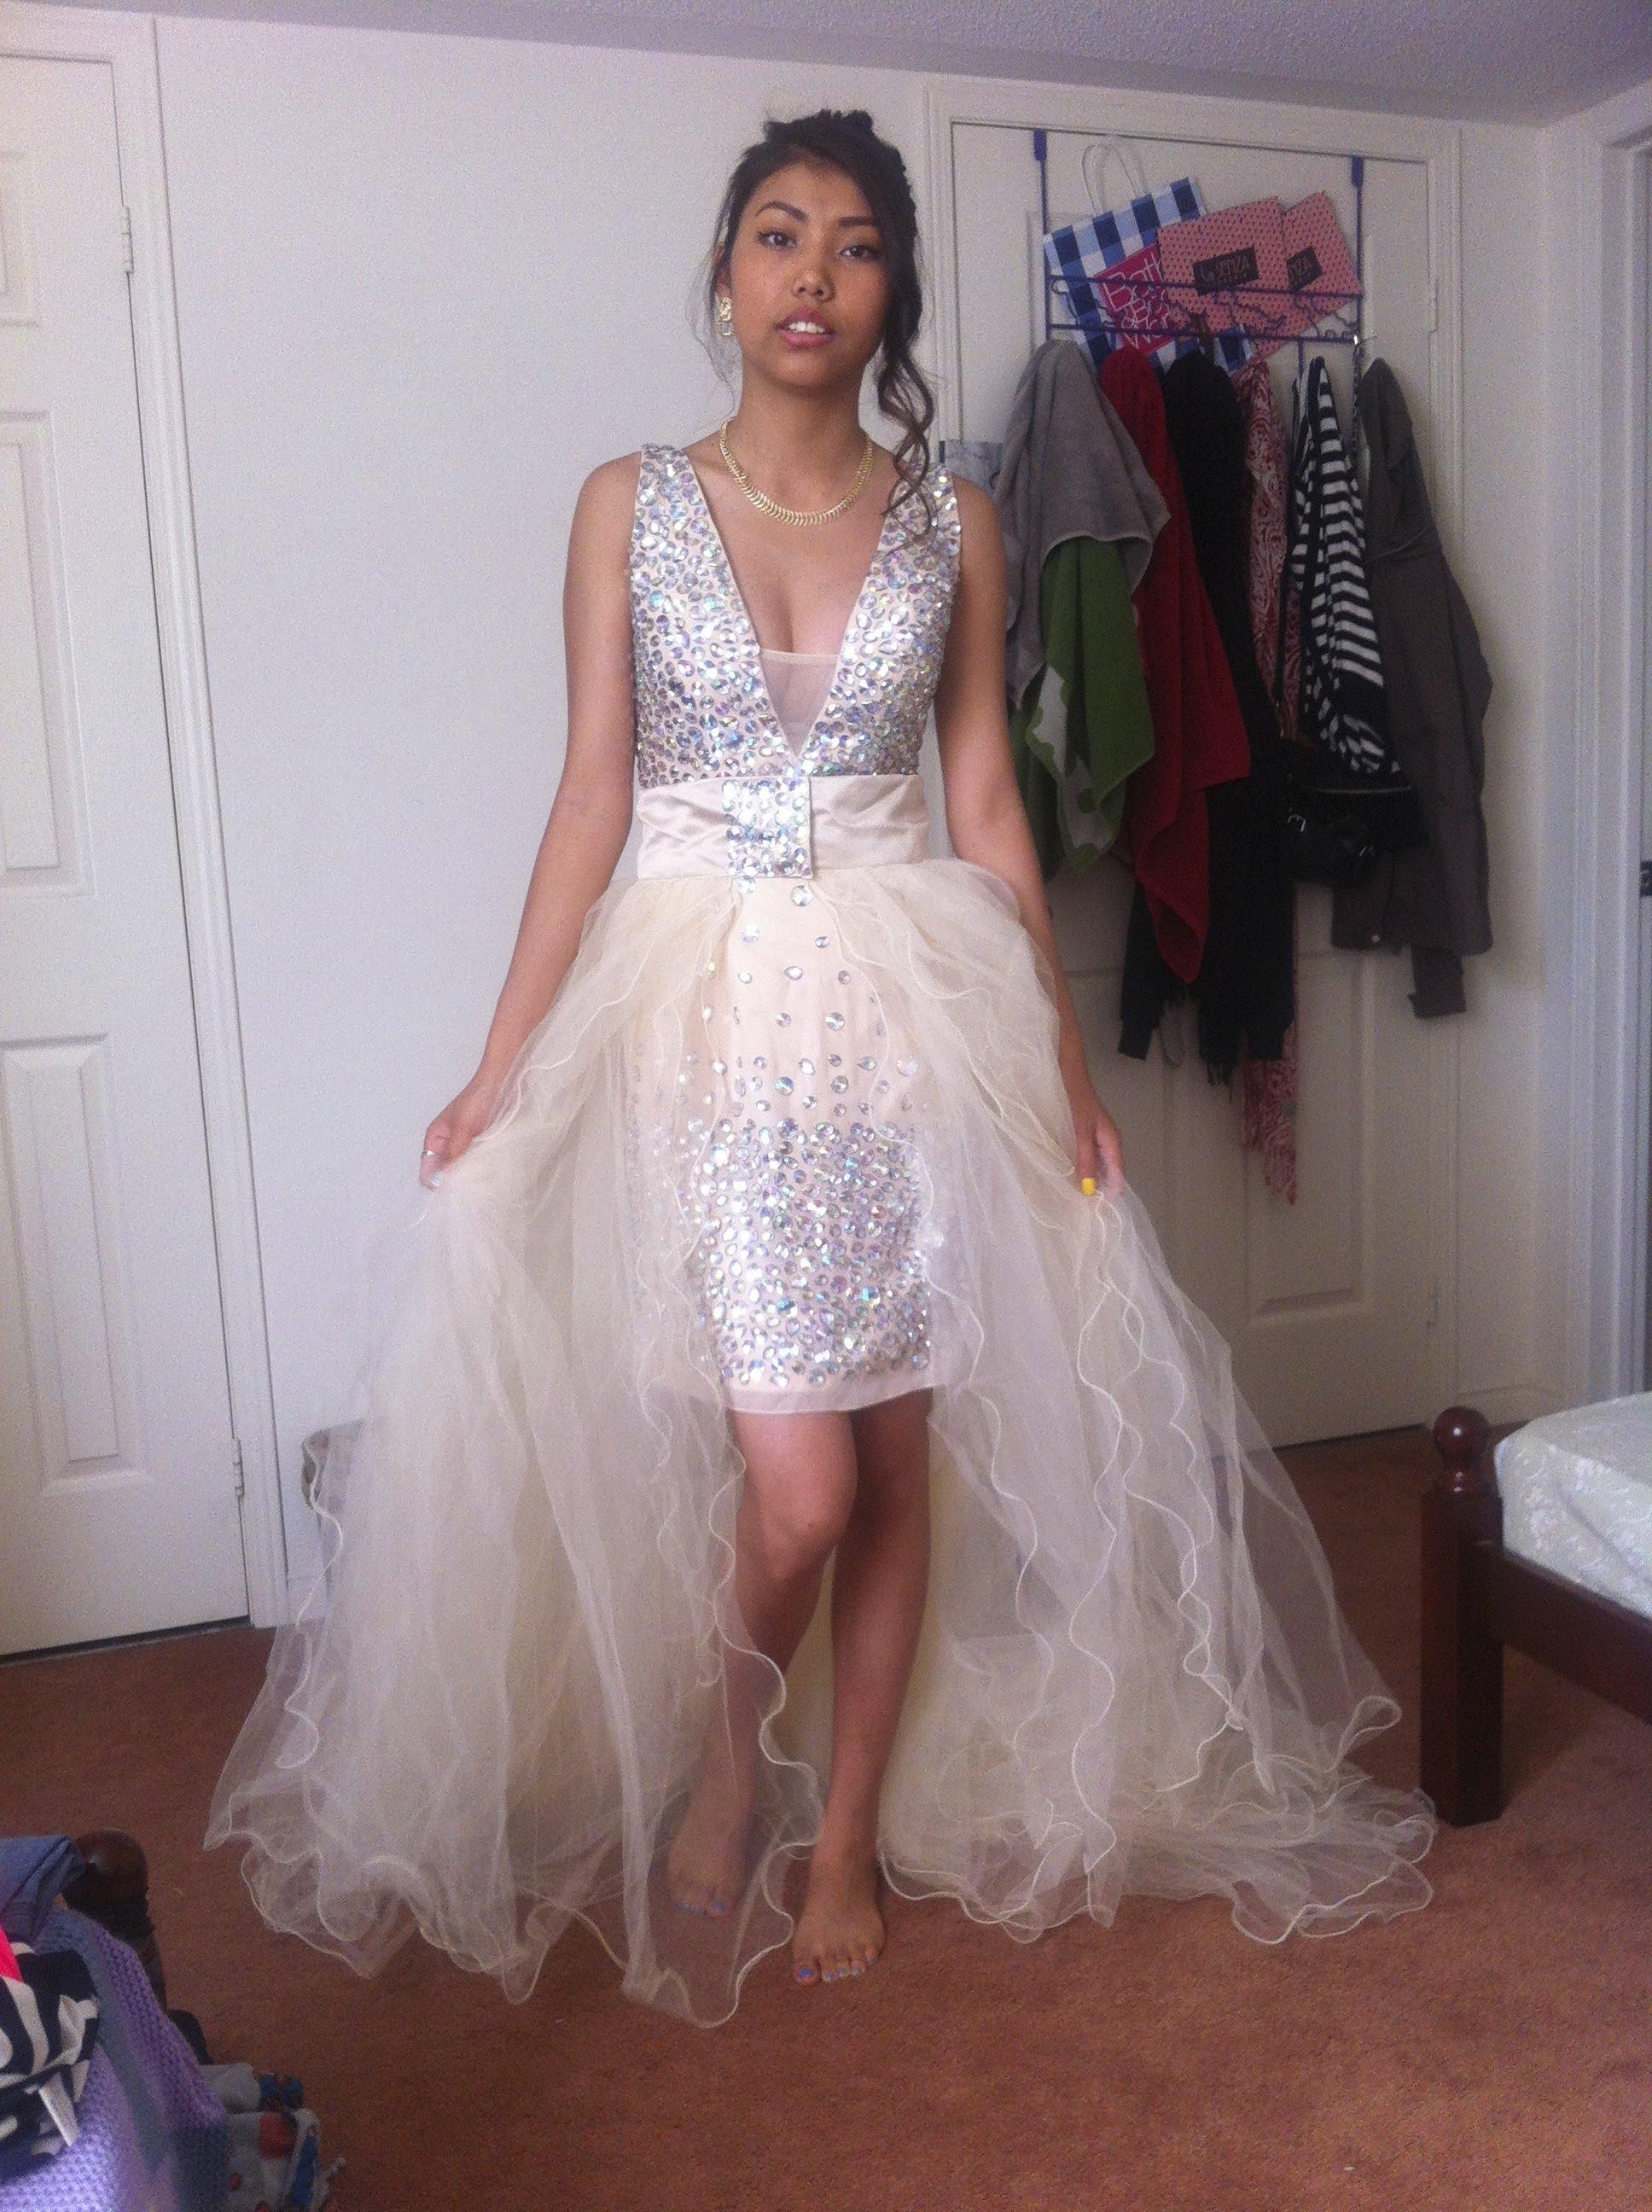 jjs house wedding dresses reviews photo - 1